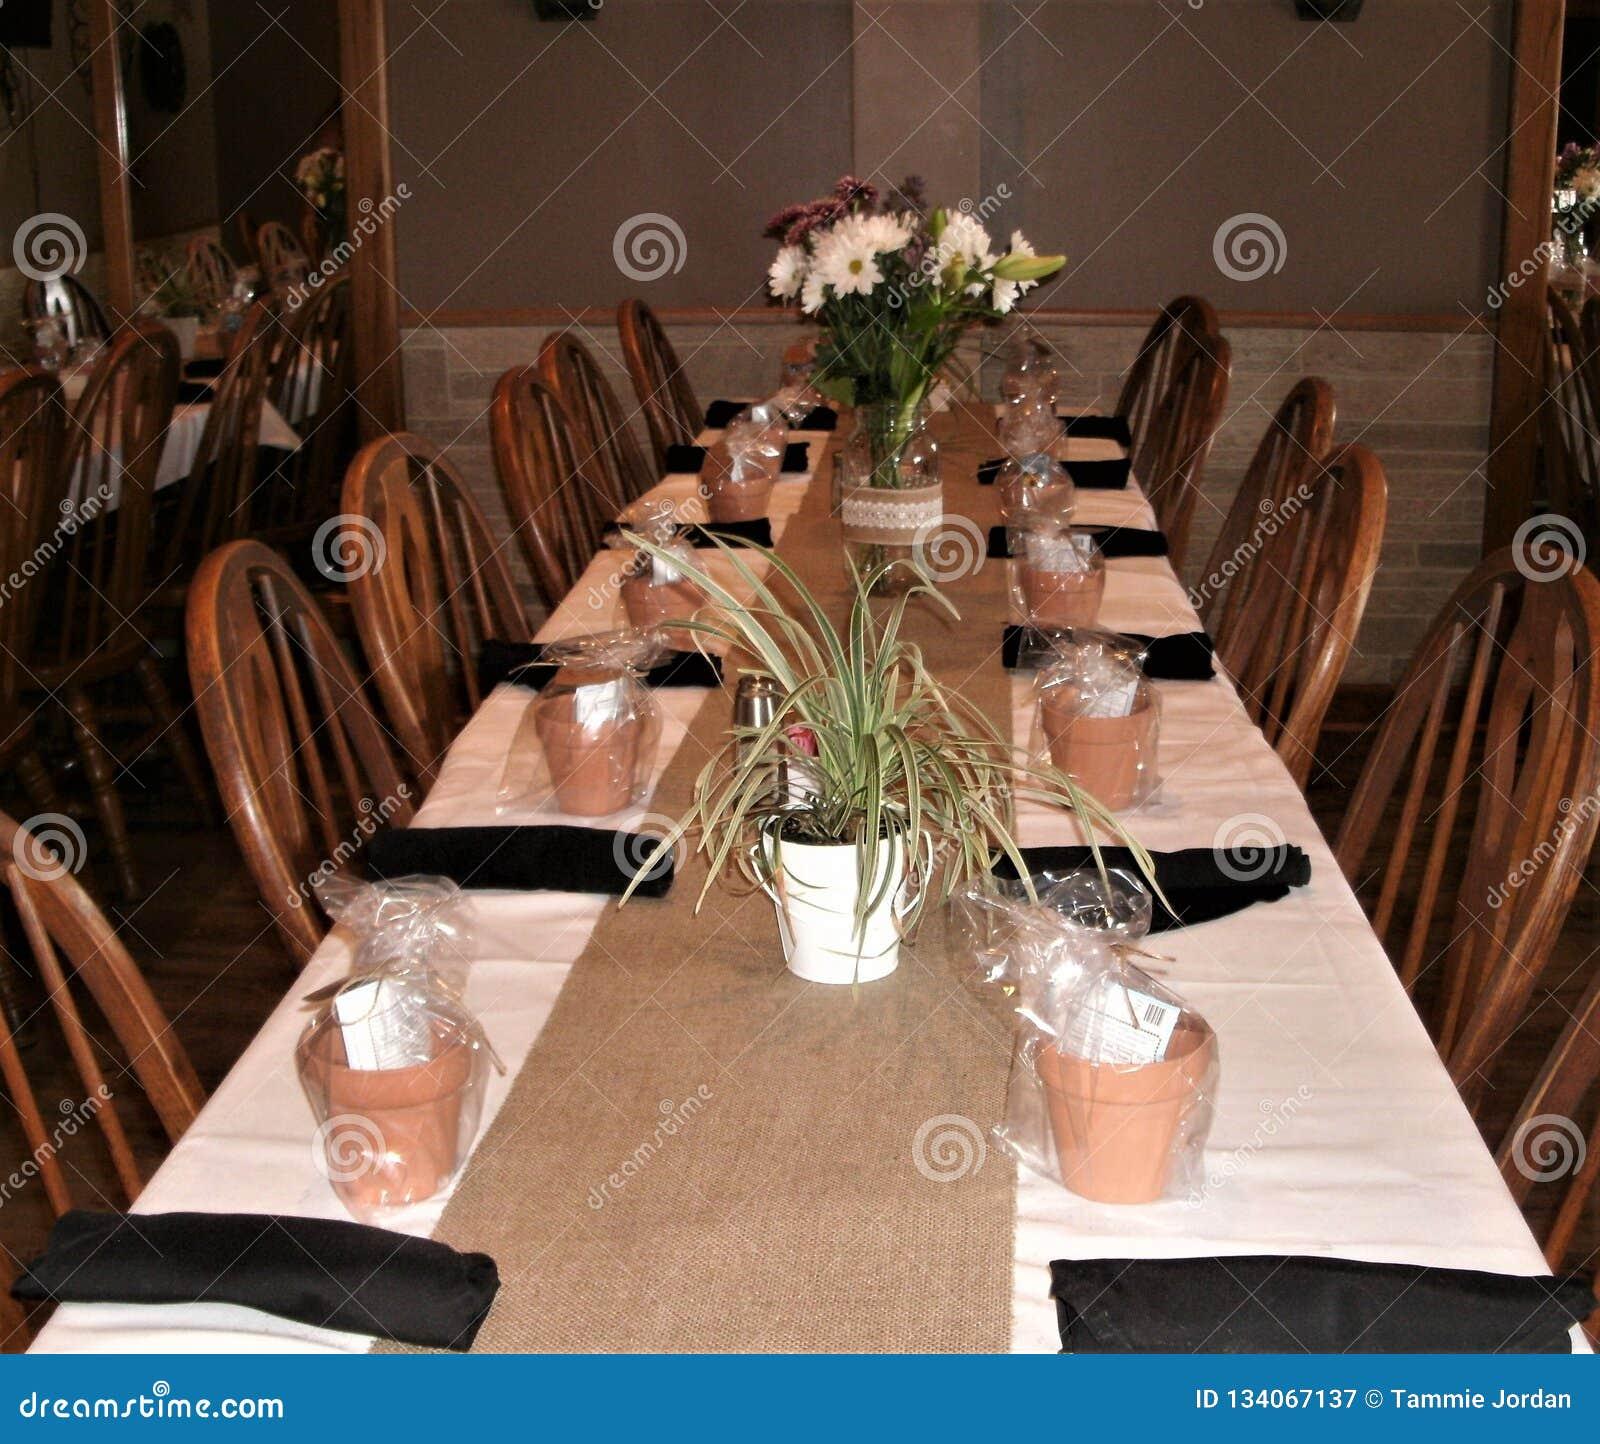 Farmhouse Party Table Setup